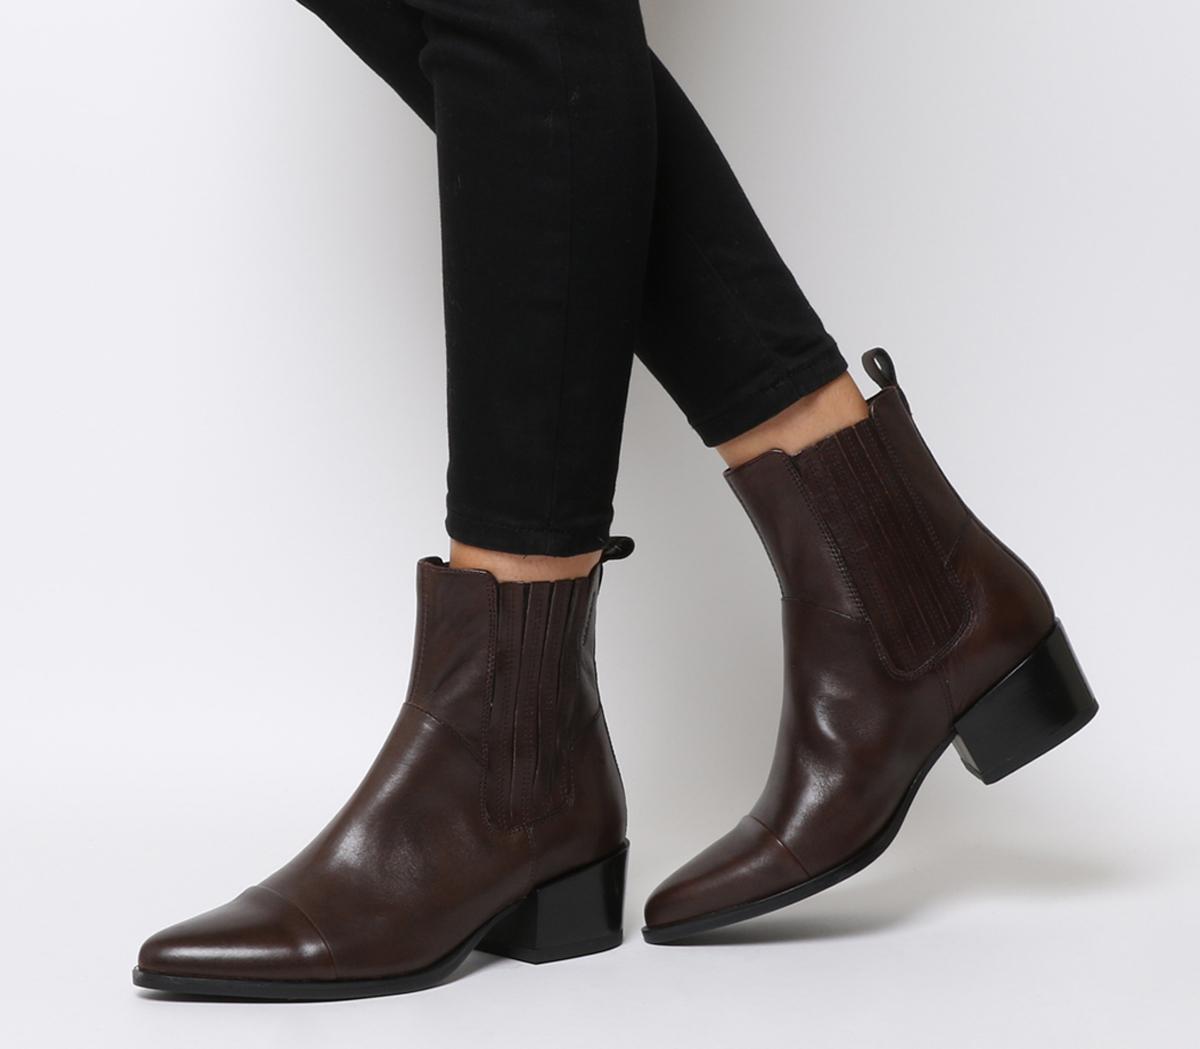 Vagabond Marja Chelsea Boots Espresso